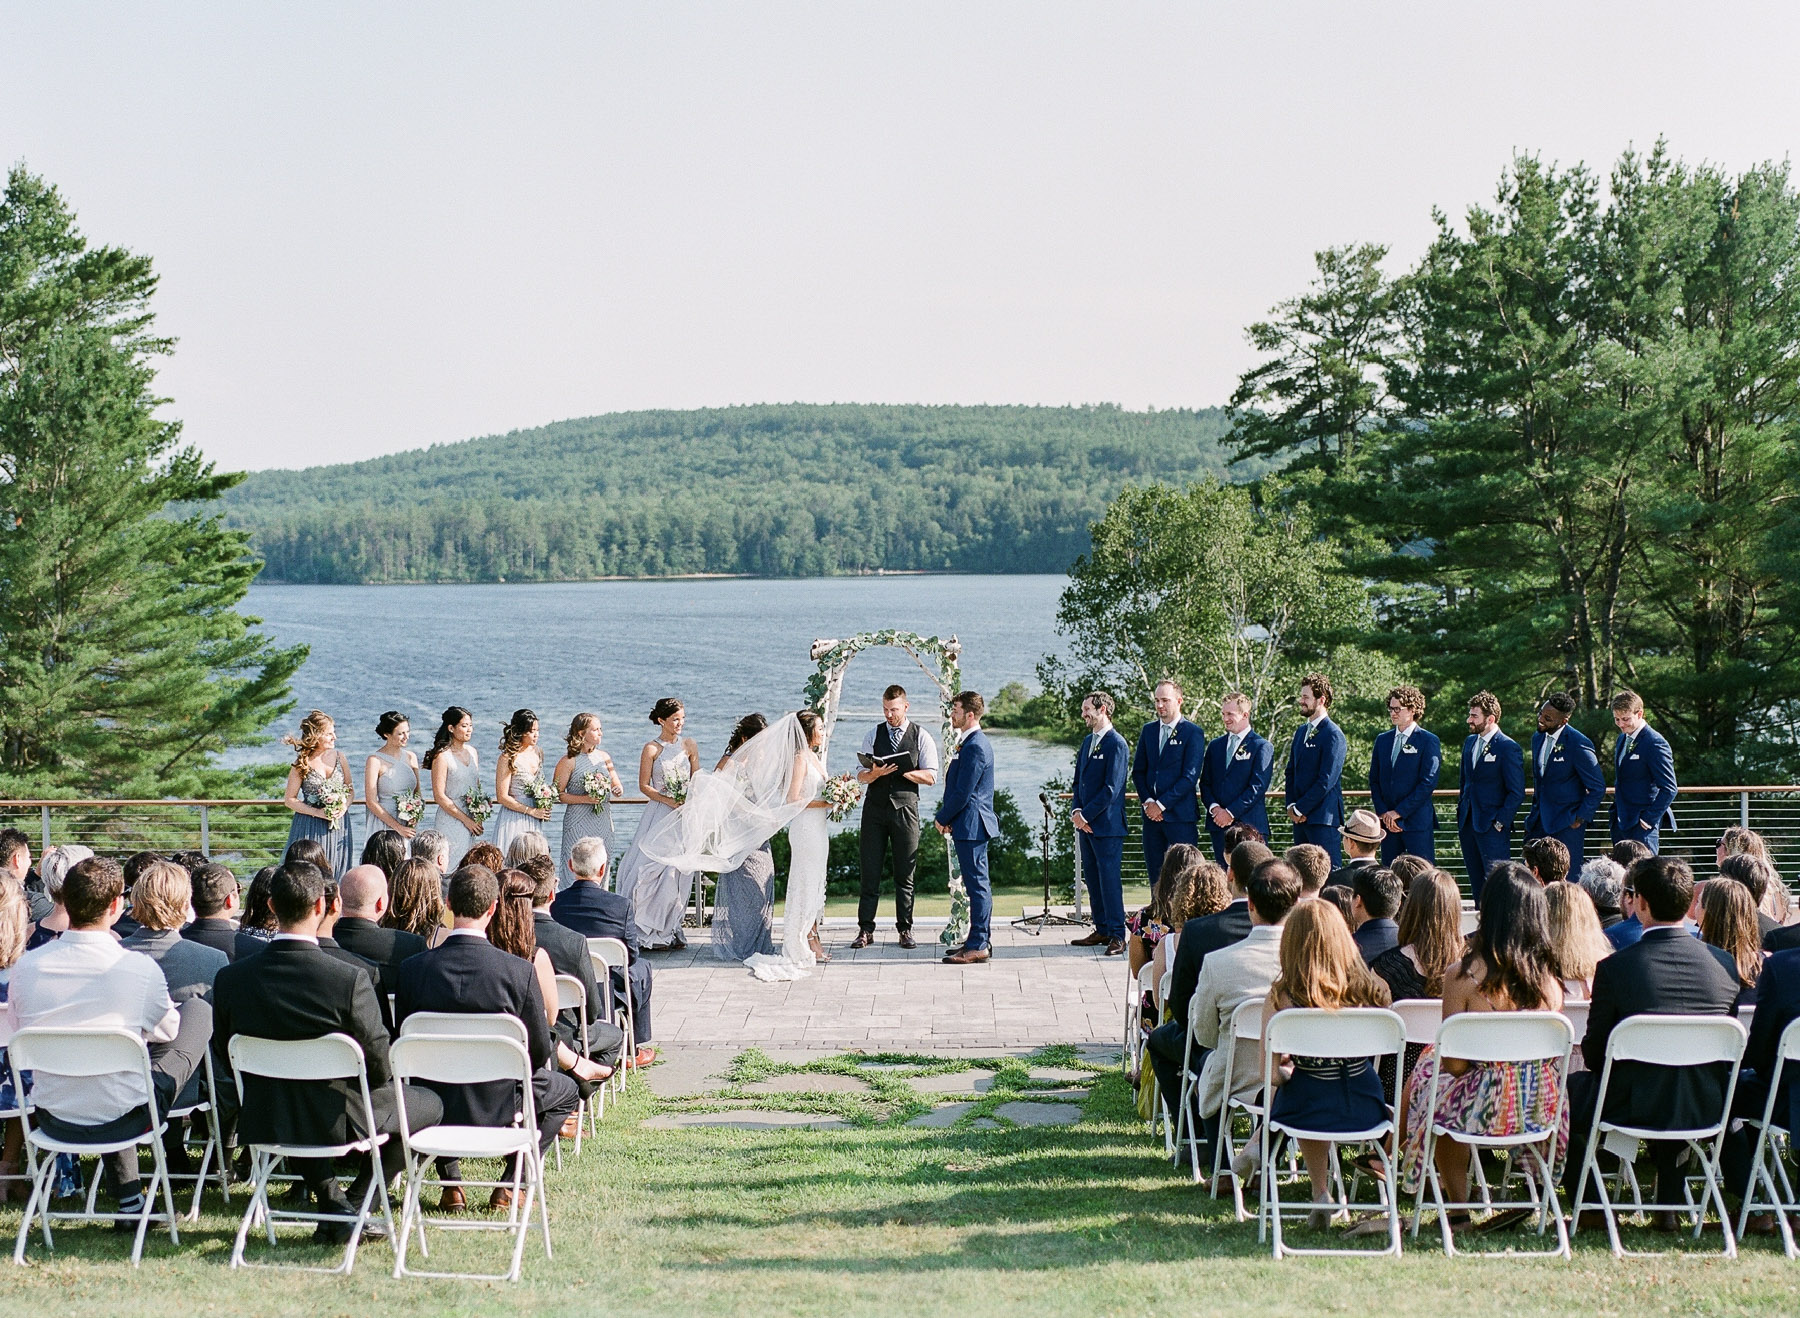 Ceremony Bear Mountain Inn Waterford Maine Wedding